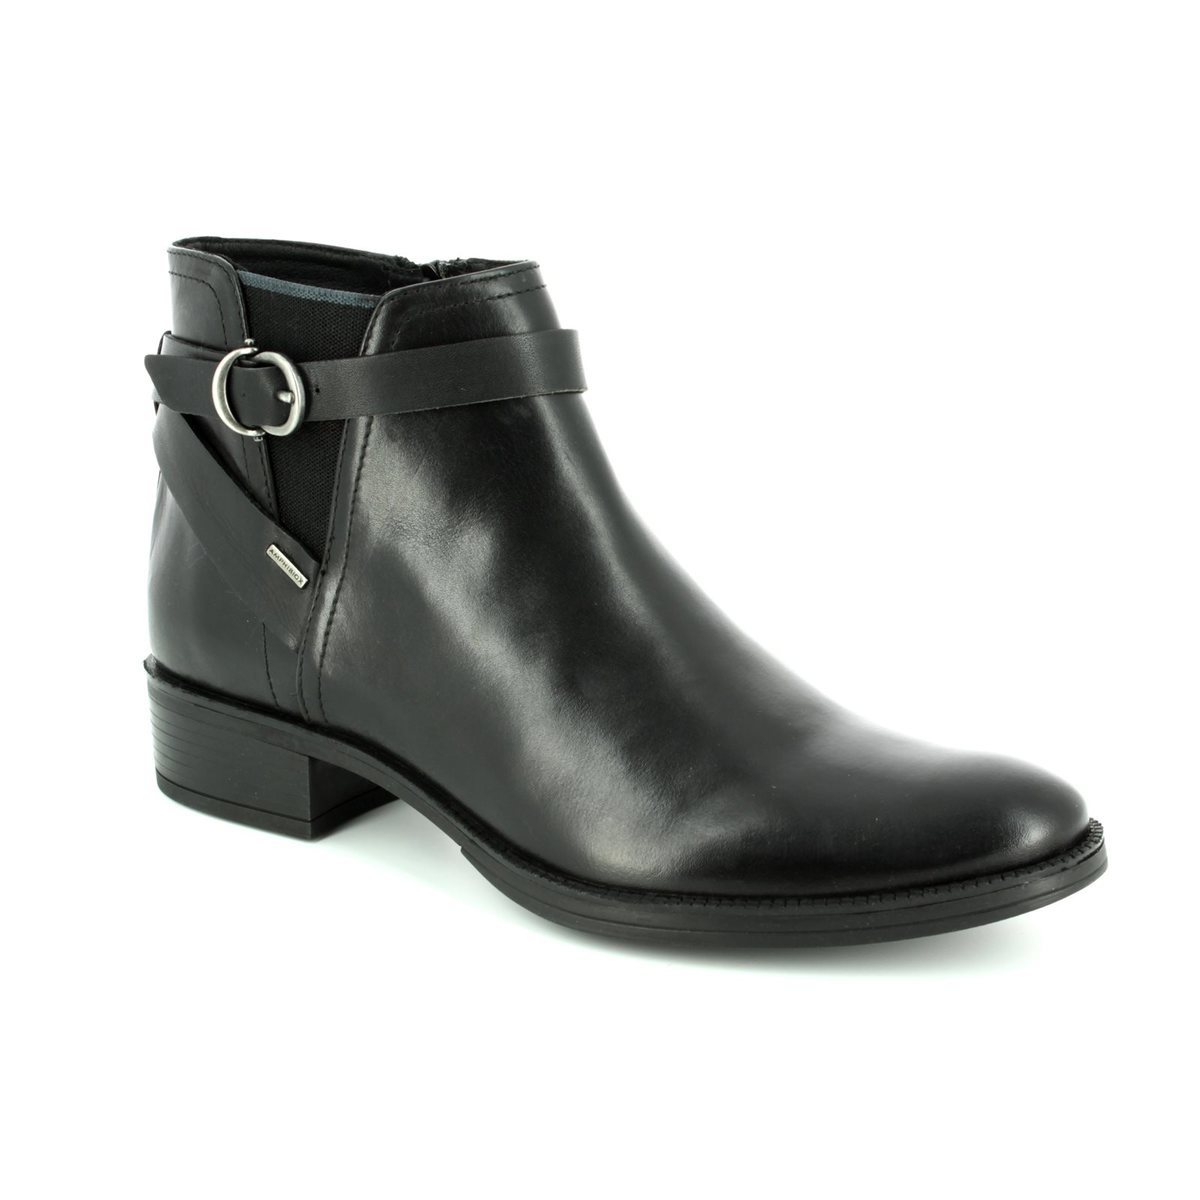 03fc4a0b694 Geox Ankle Boots - Black - D746SD/C9999 MENDI D TEX